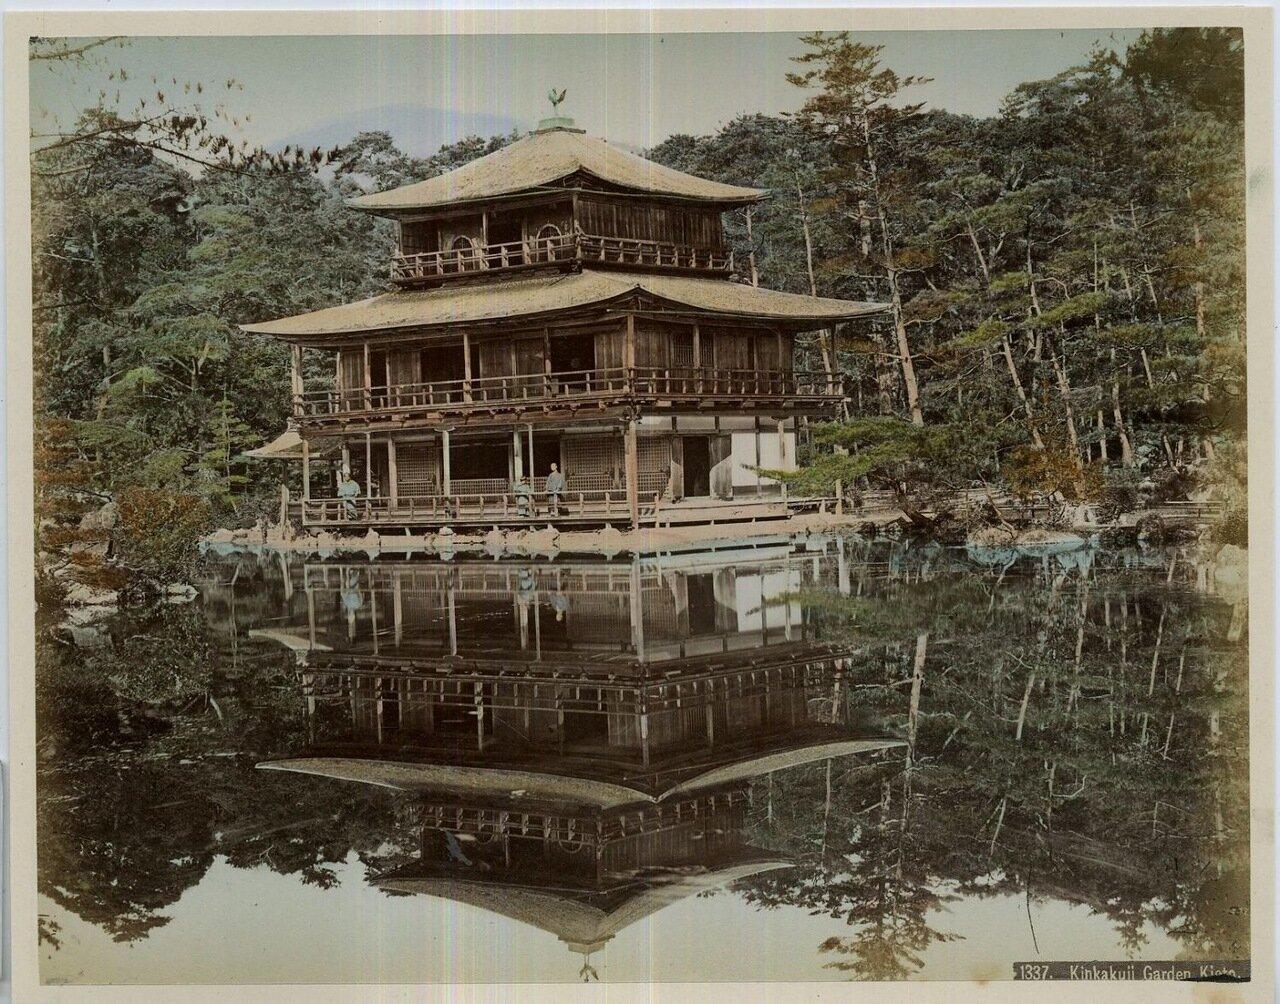 Киото. Сады Кинкаку-дзи